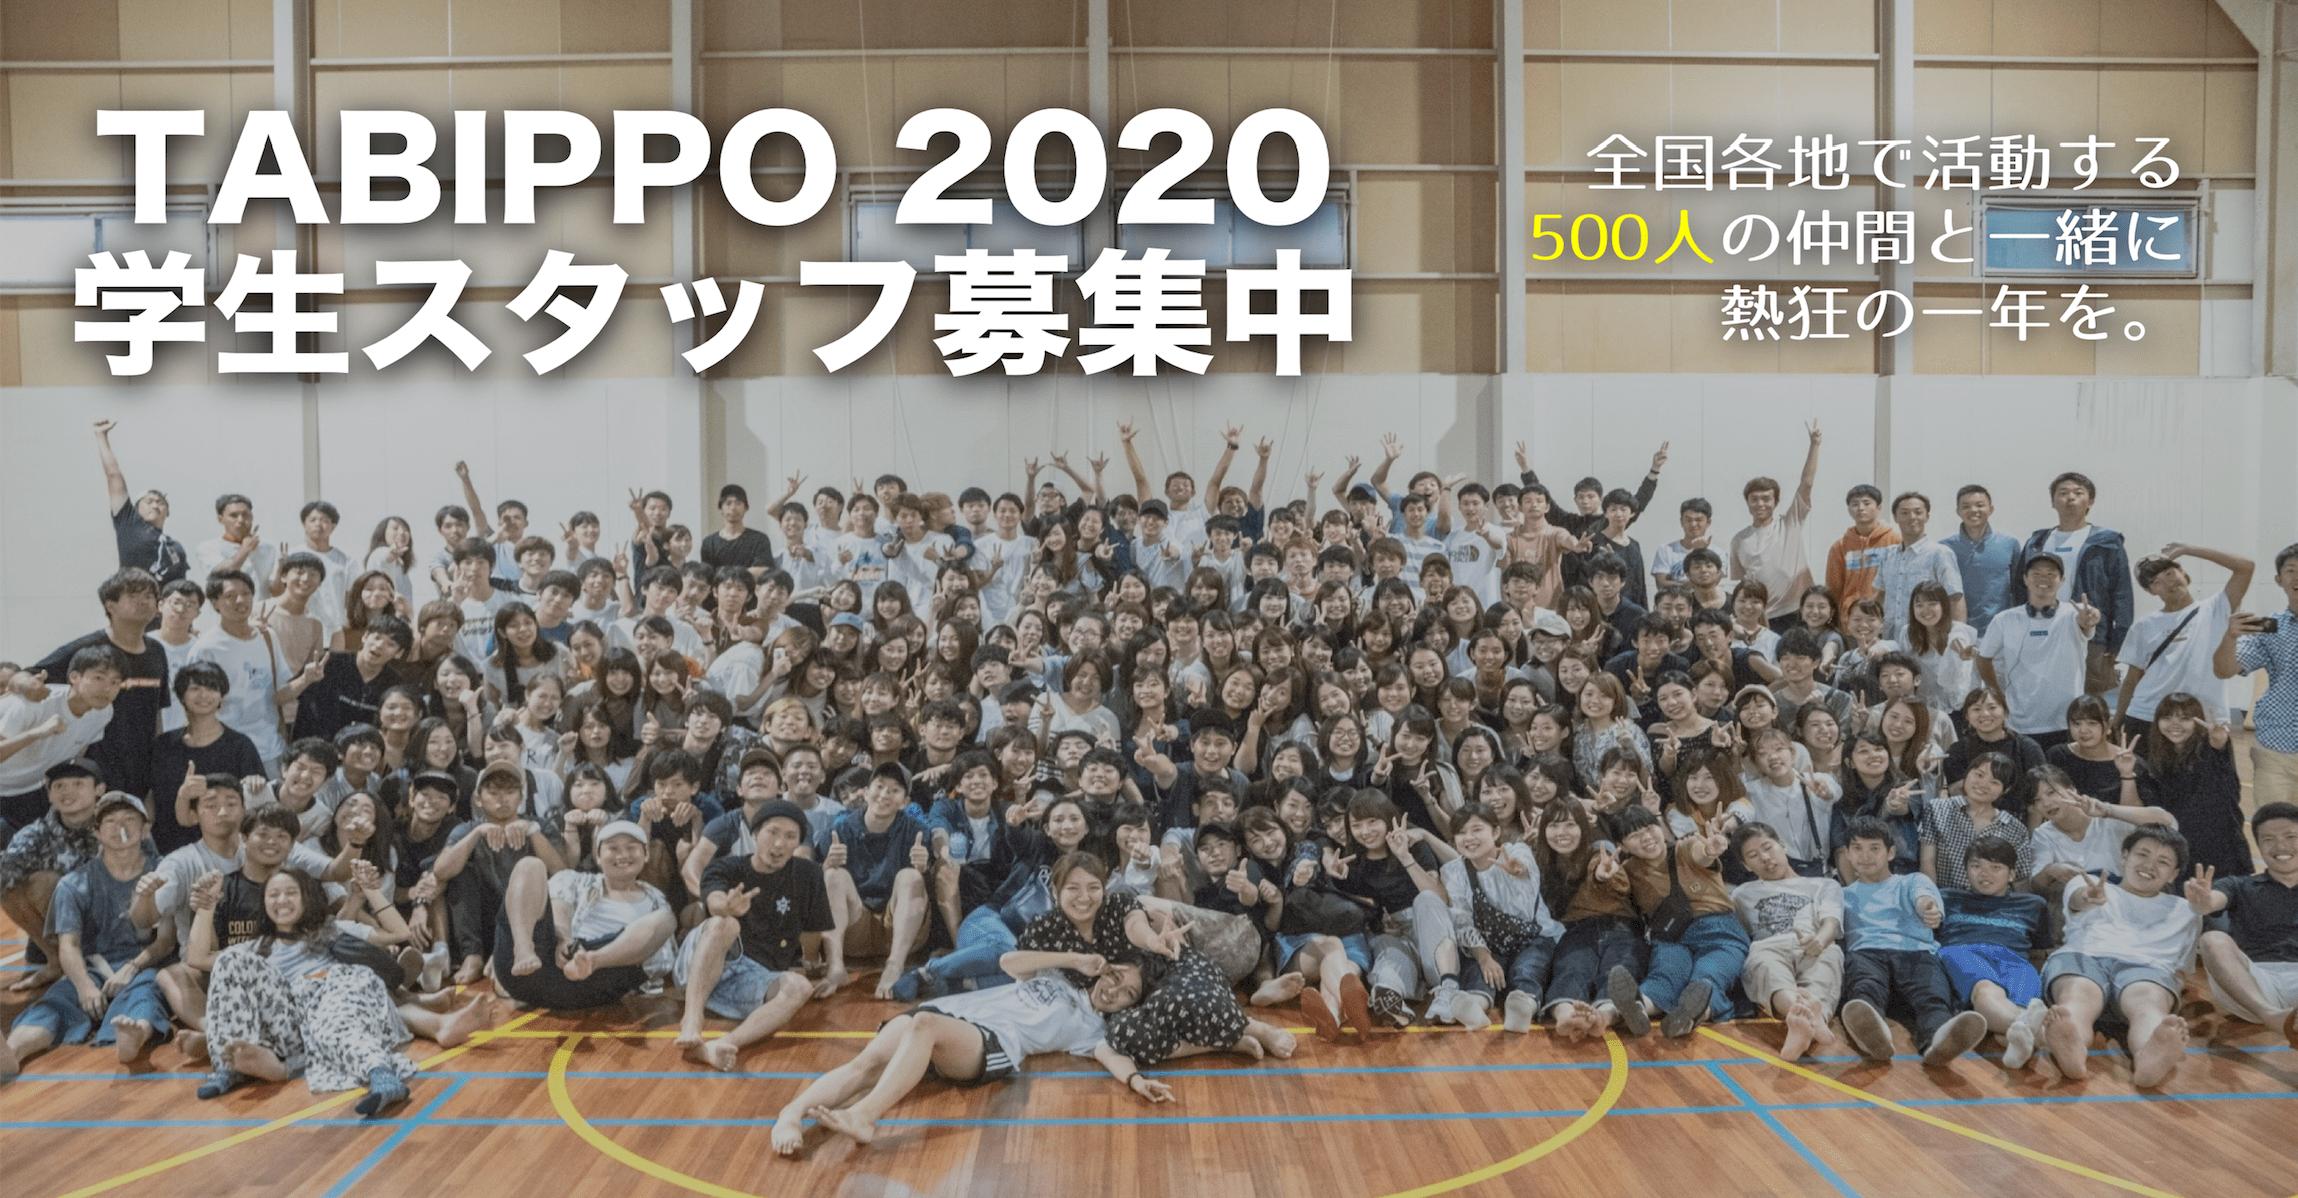 TABIPPO2020 学生スタッフ募集中!!